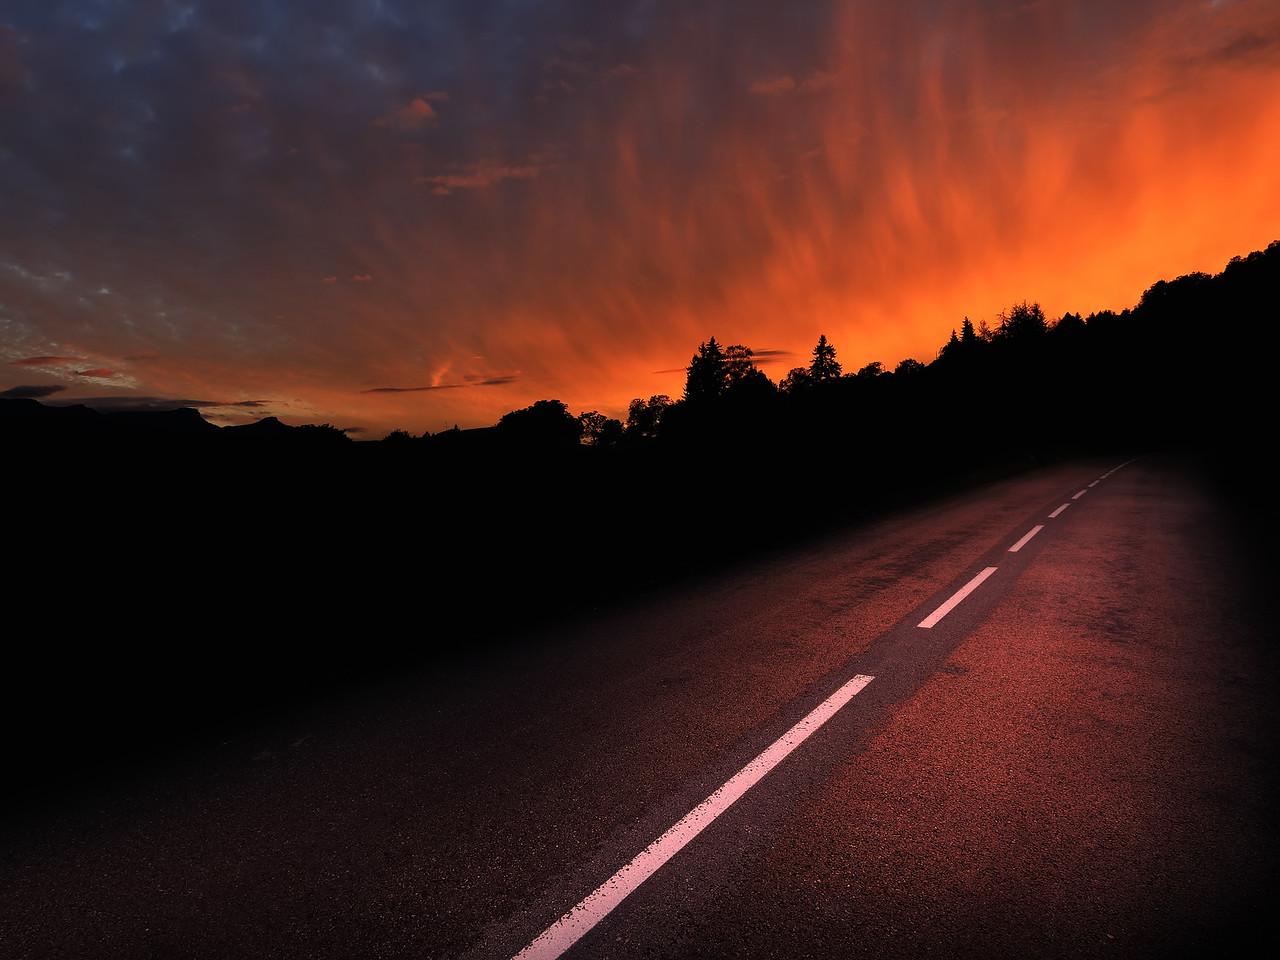 Illuminer le chemin